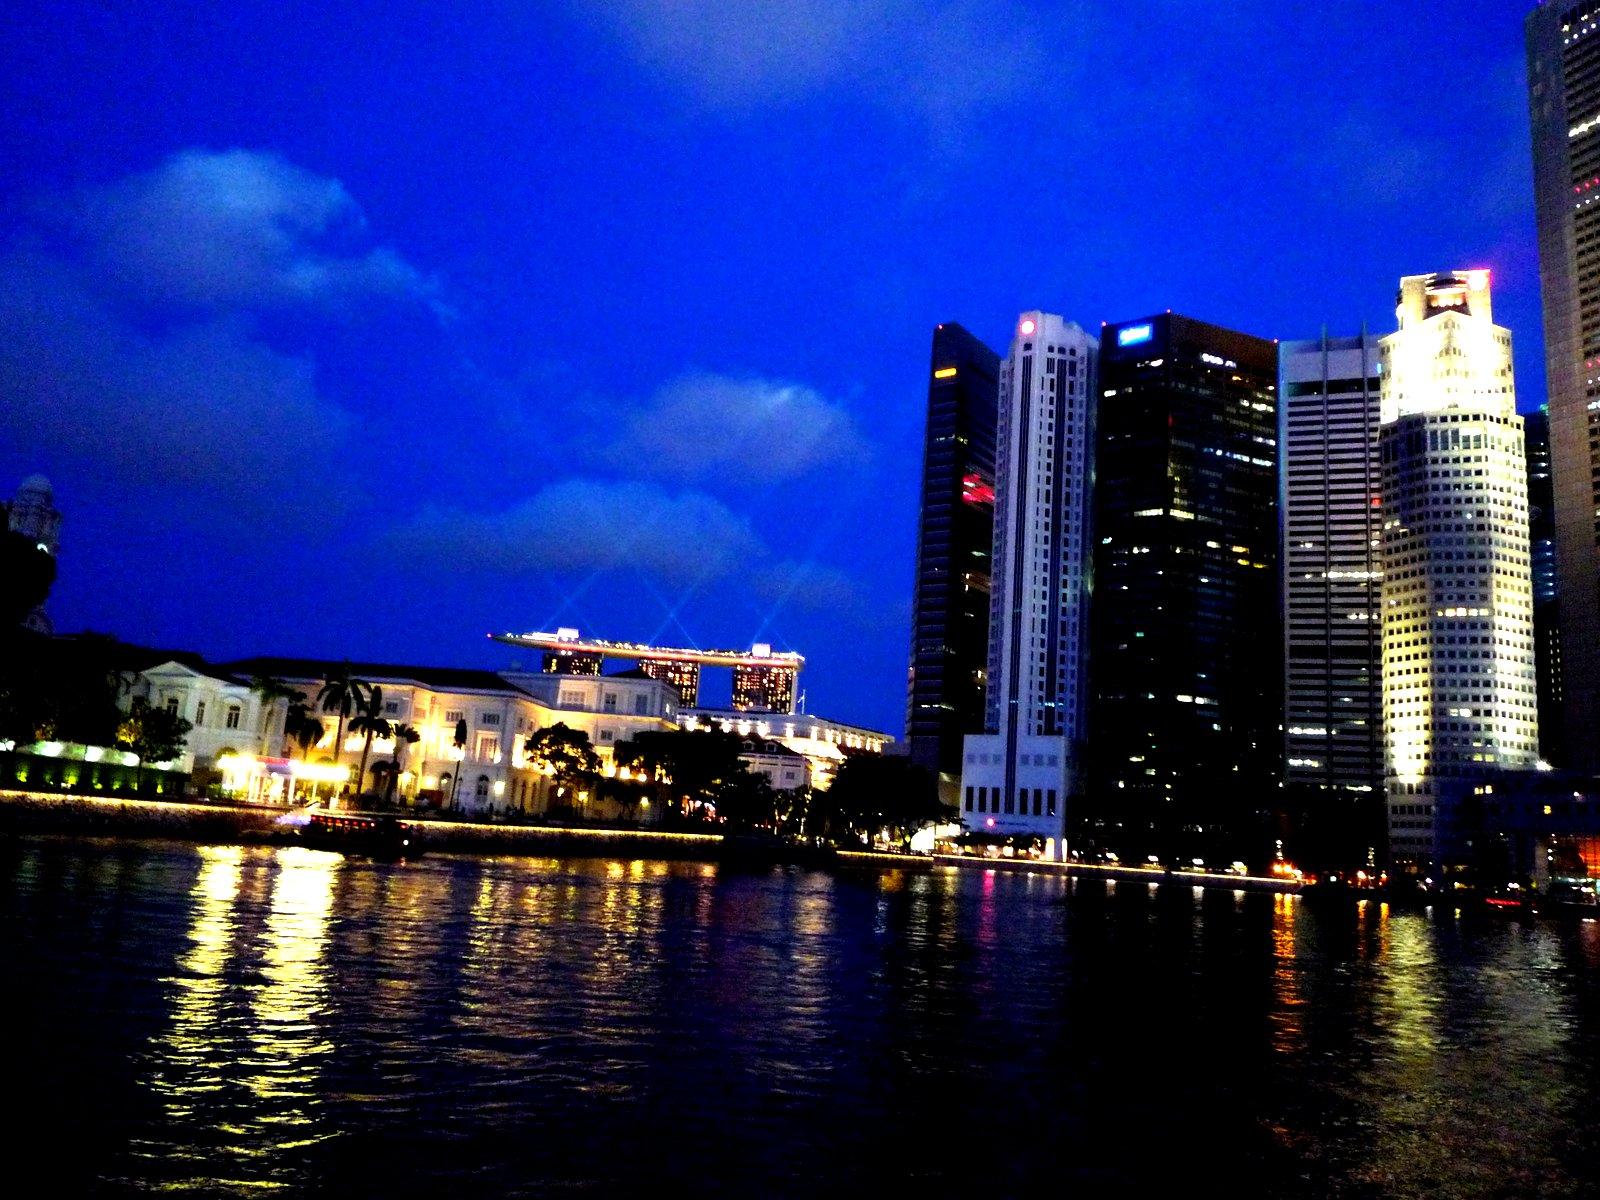 Marina bay sands urban architecture now - Bay architecture ...